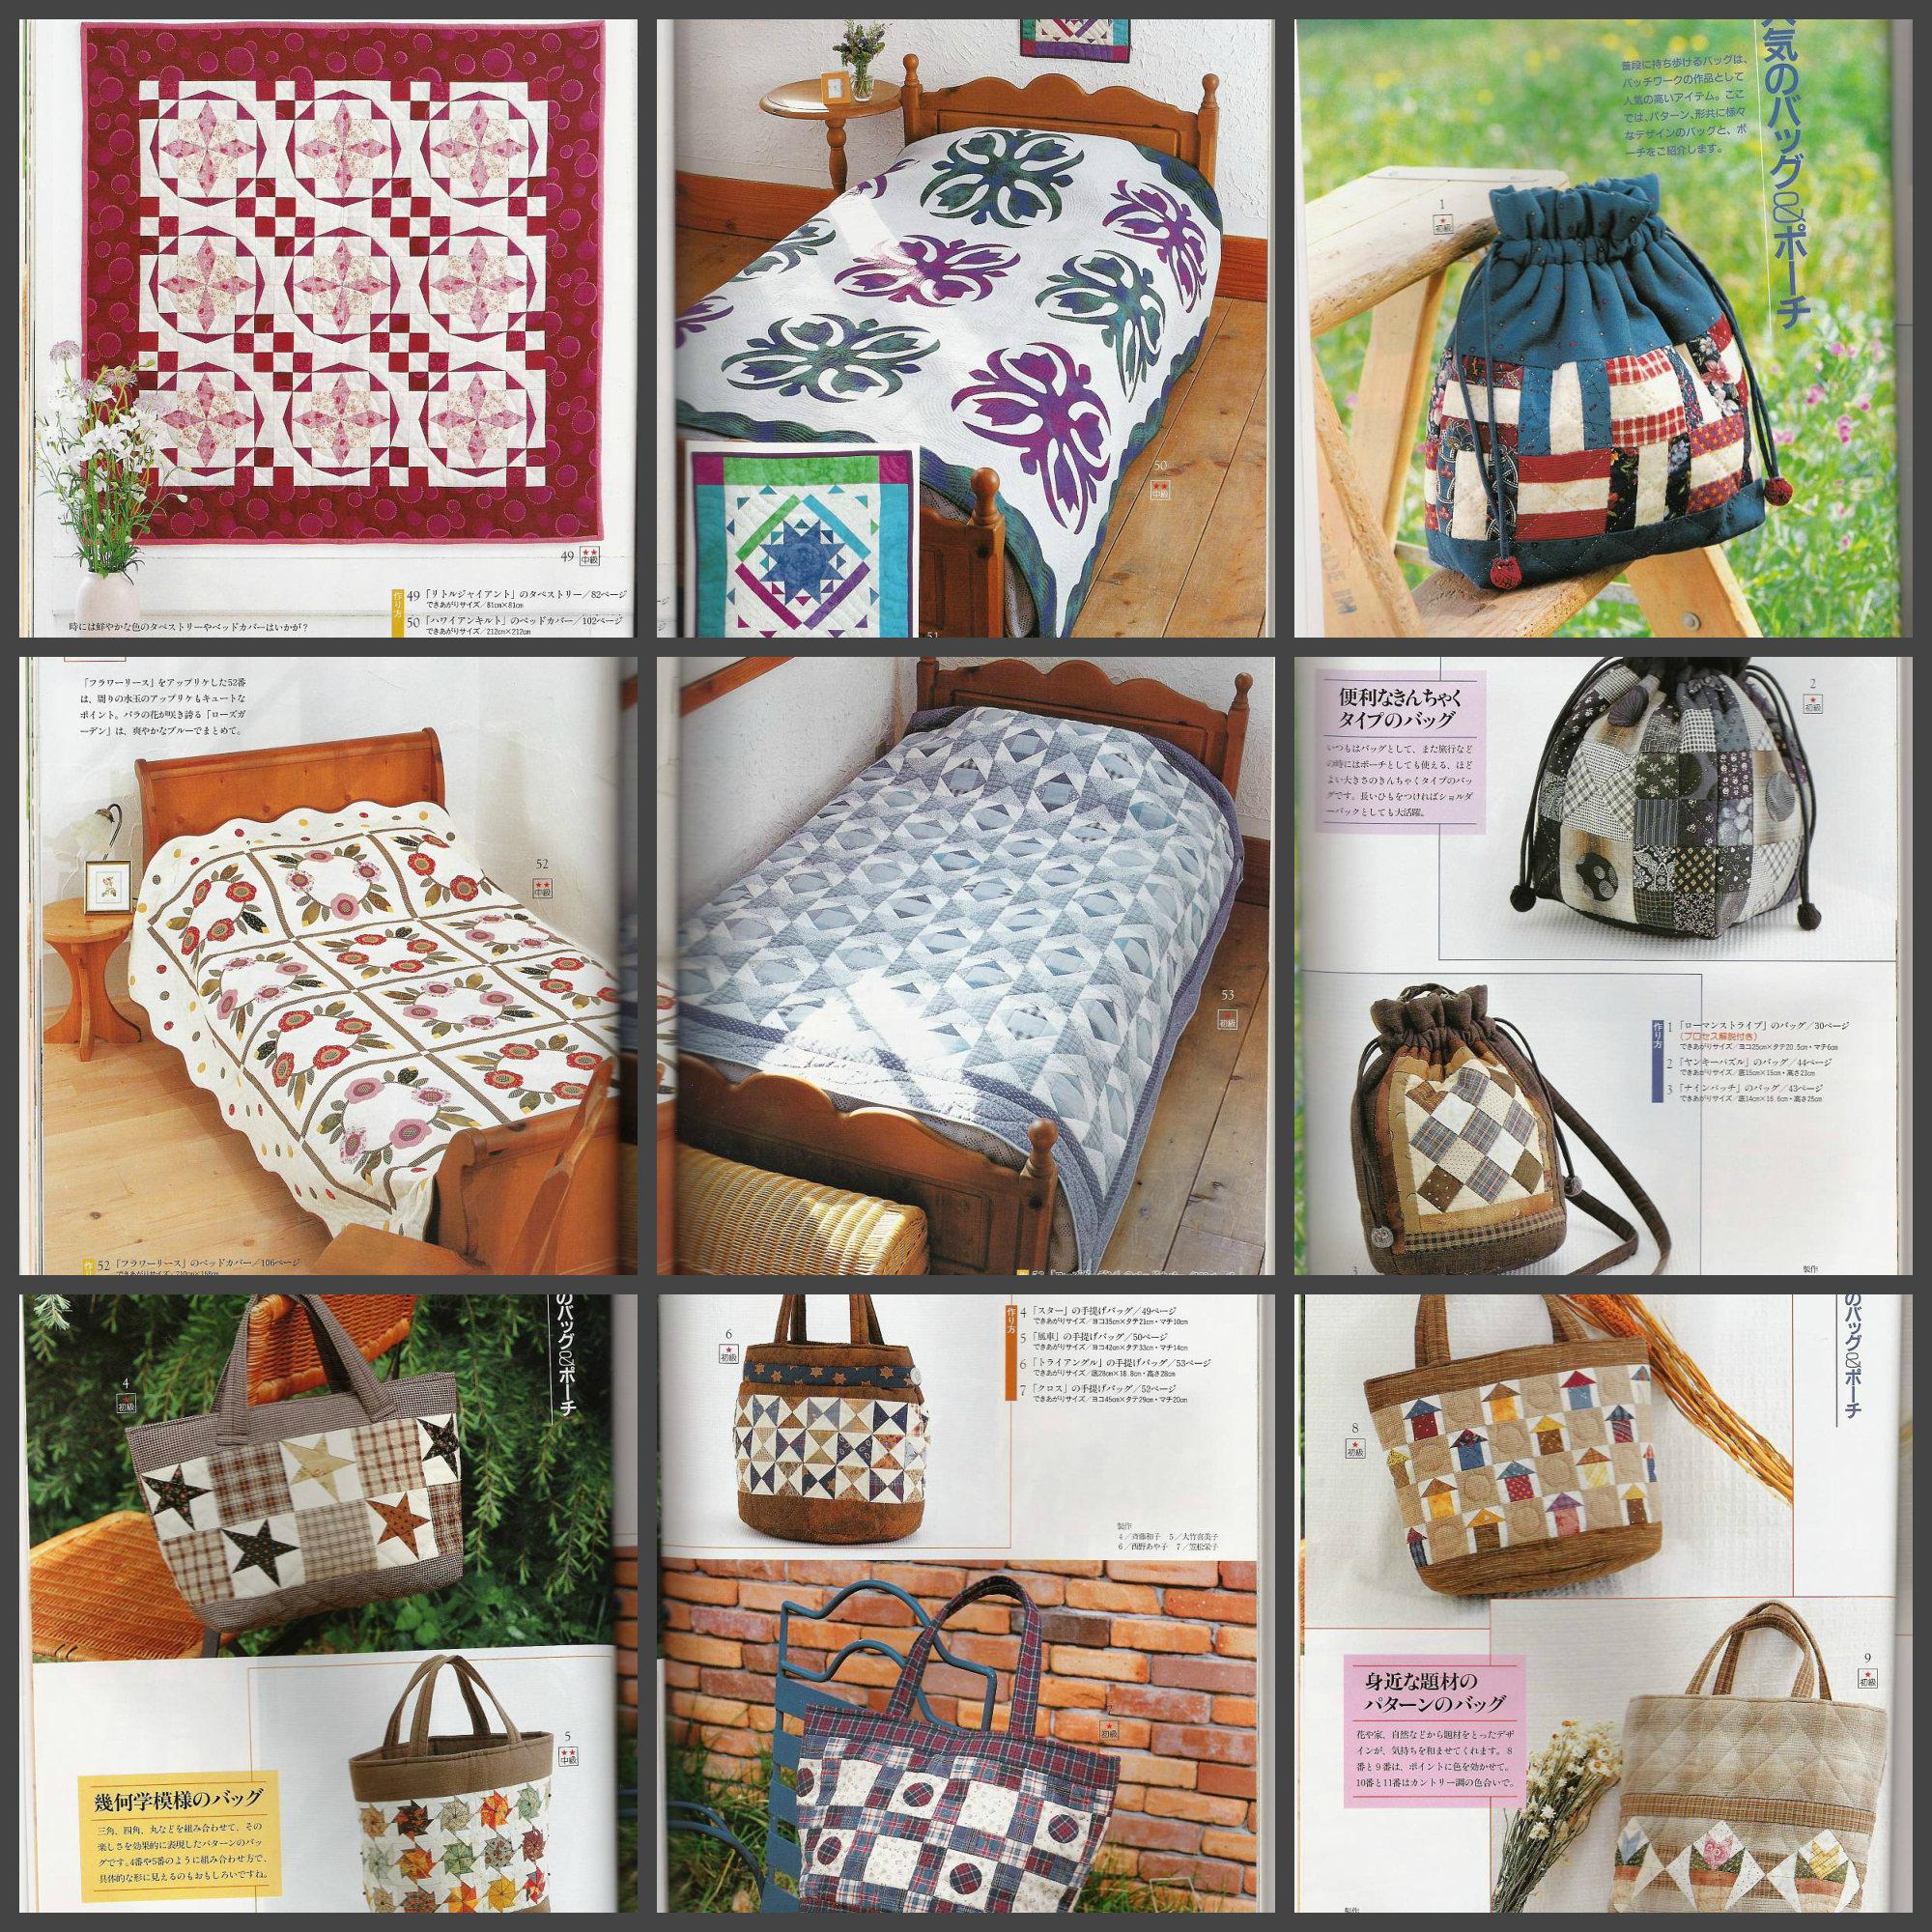 Patchwork quilt japanese ebook quilt book quilt bag patterns quilt this is a digital file jeuxipadfo Gallery